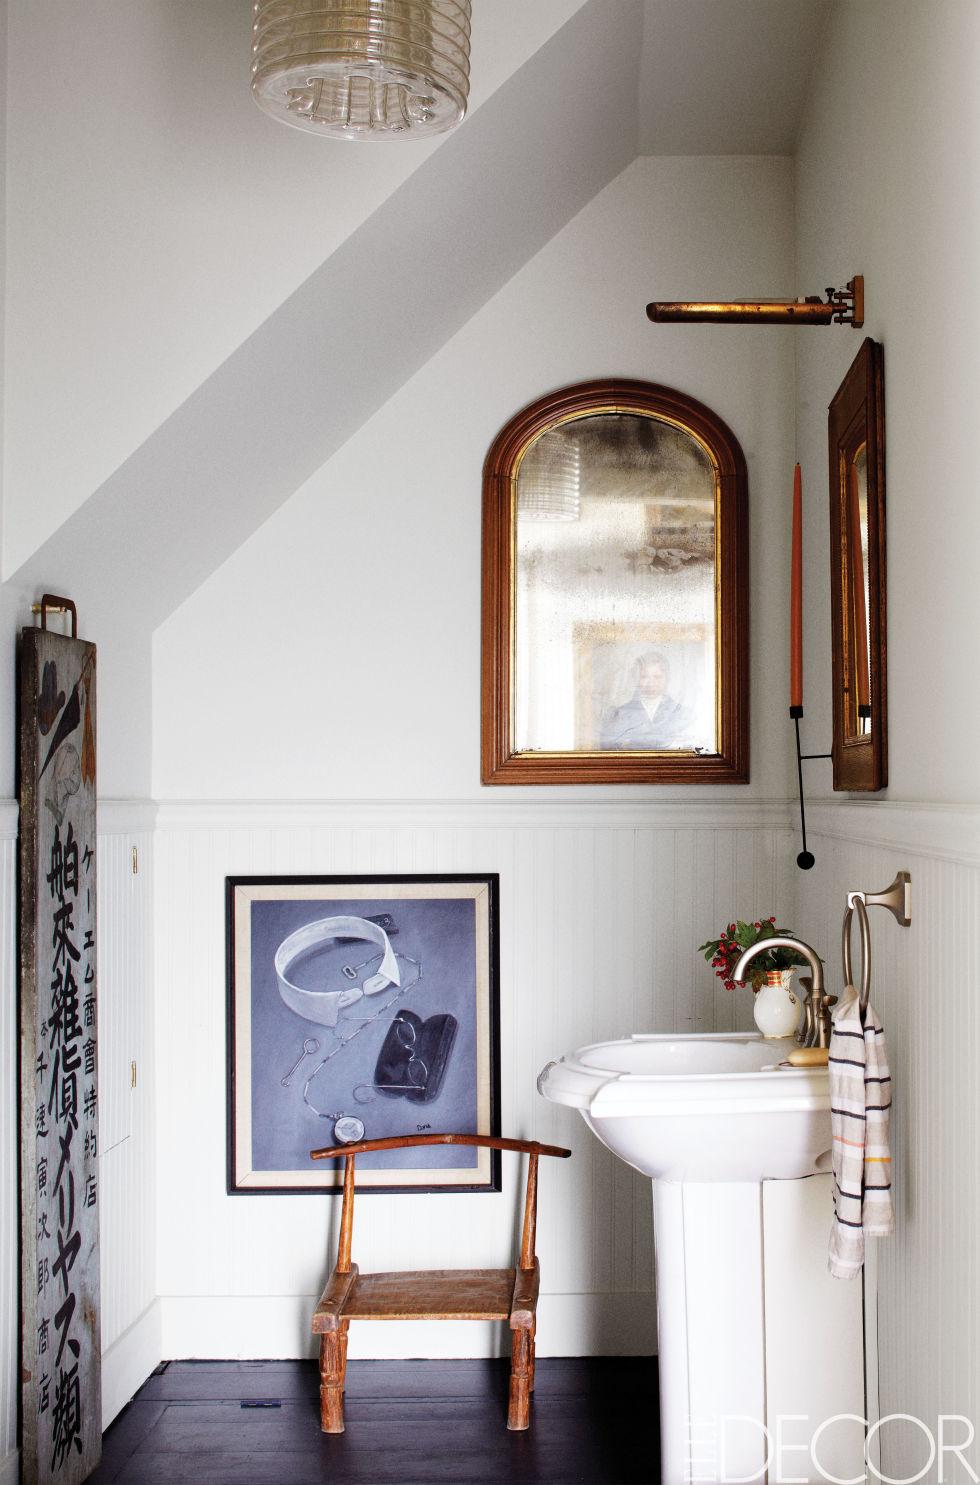 Custom Frames For Bathroom Mirrors Louisiana Bucket Brigade